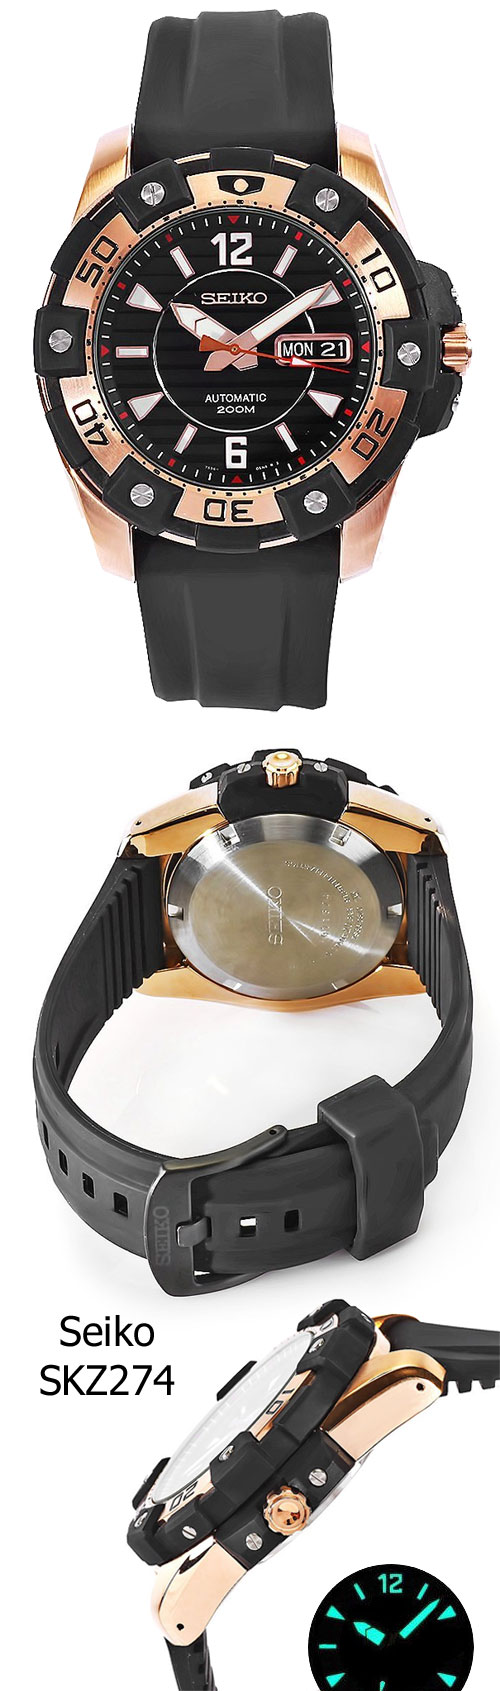 seiko_skz274_2012 rose gold new discount sale diving diver watch